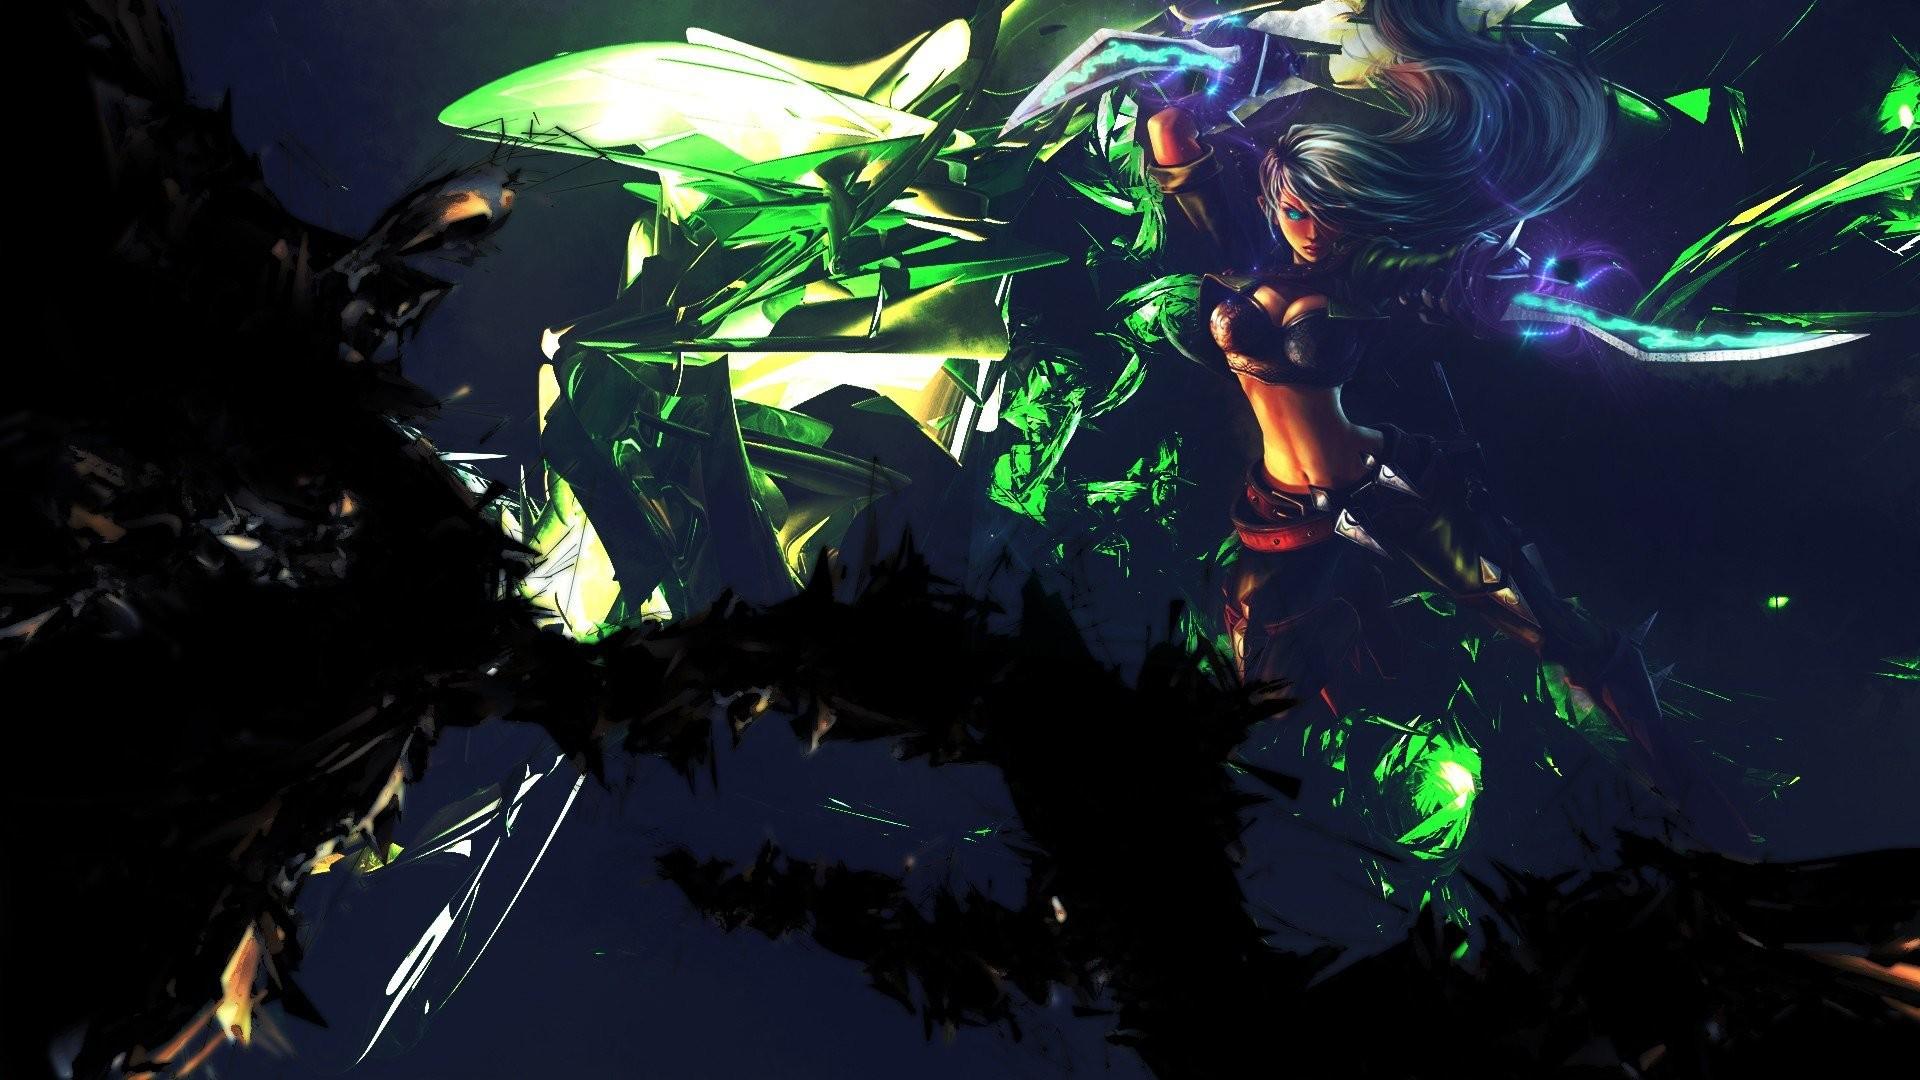 Abstract video games League of Legends Mercenary Katarina Game characters  wallpaper     288833   WallpaperUP